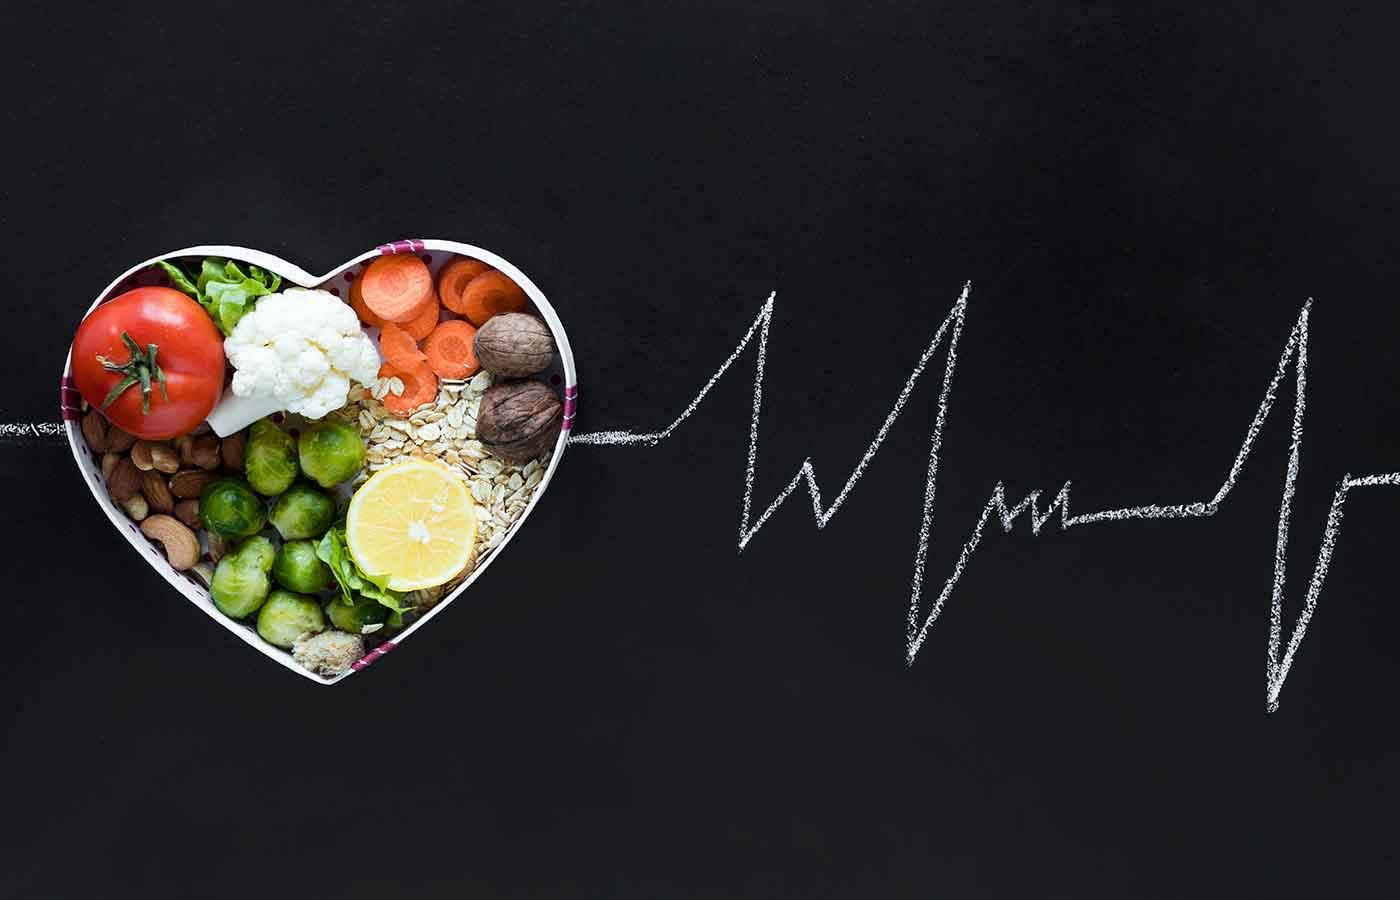 Evitar enfermedades cardiovasculares con la dieta veg